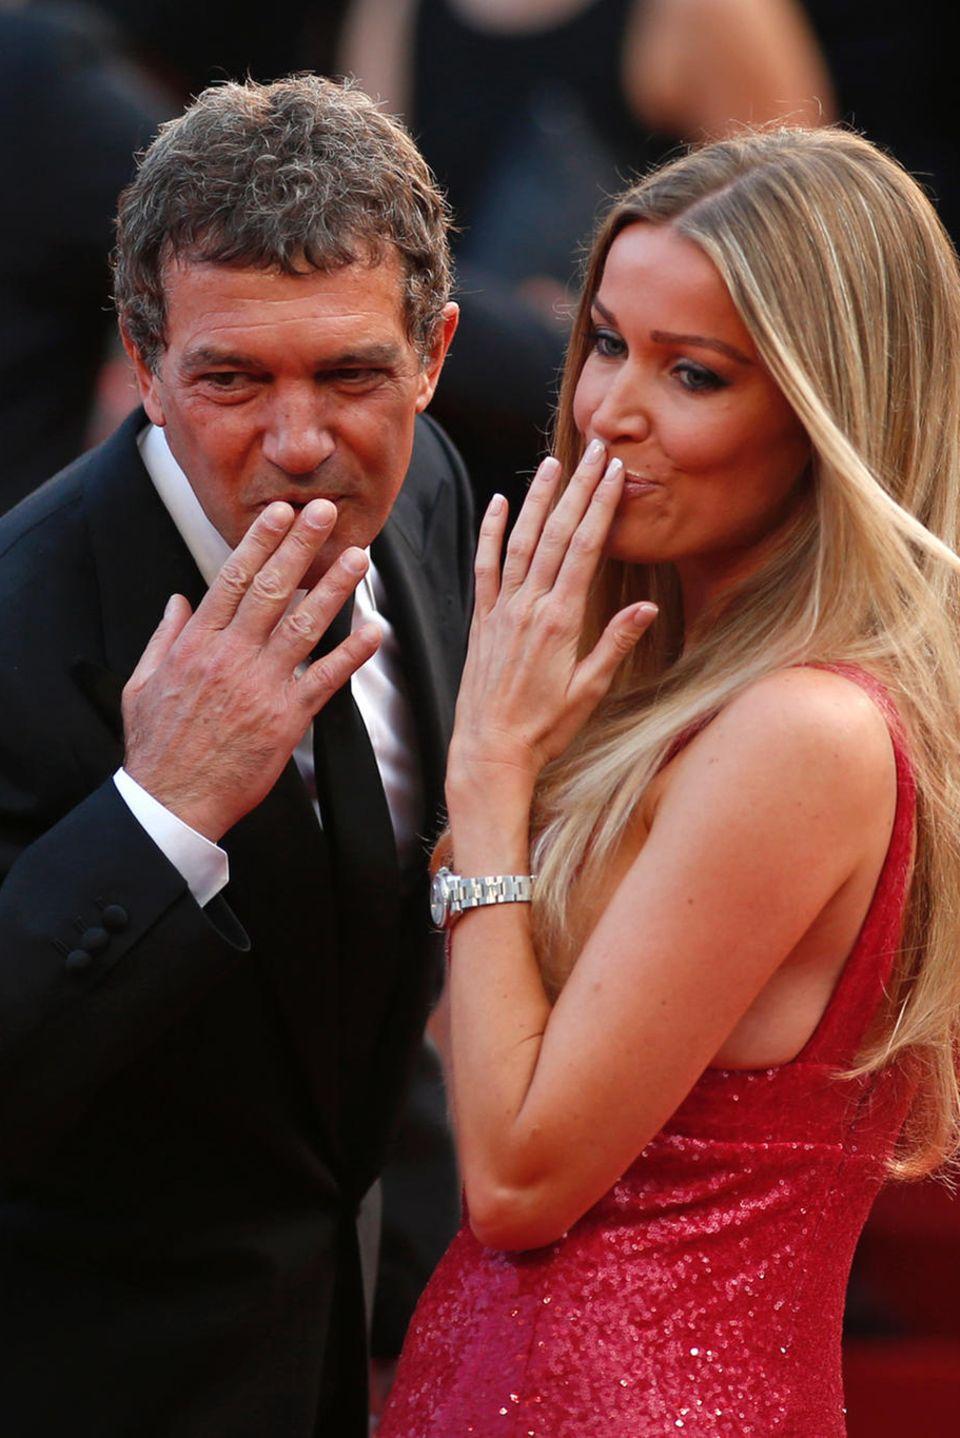 Antonio Banderas und Freundin Nicole in Cannes